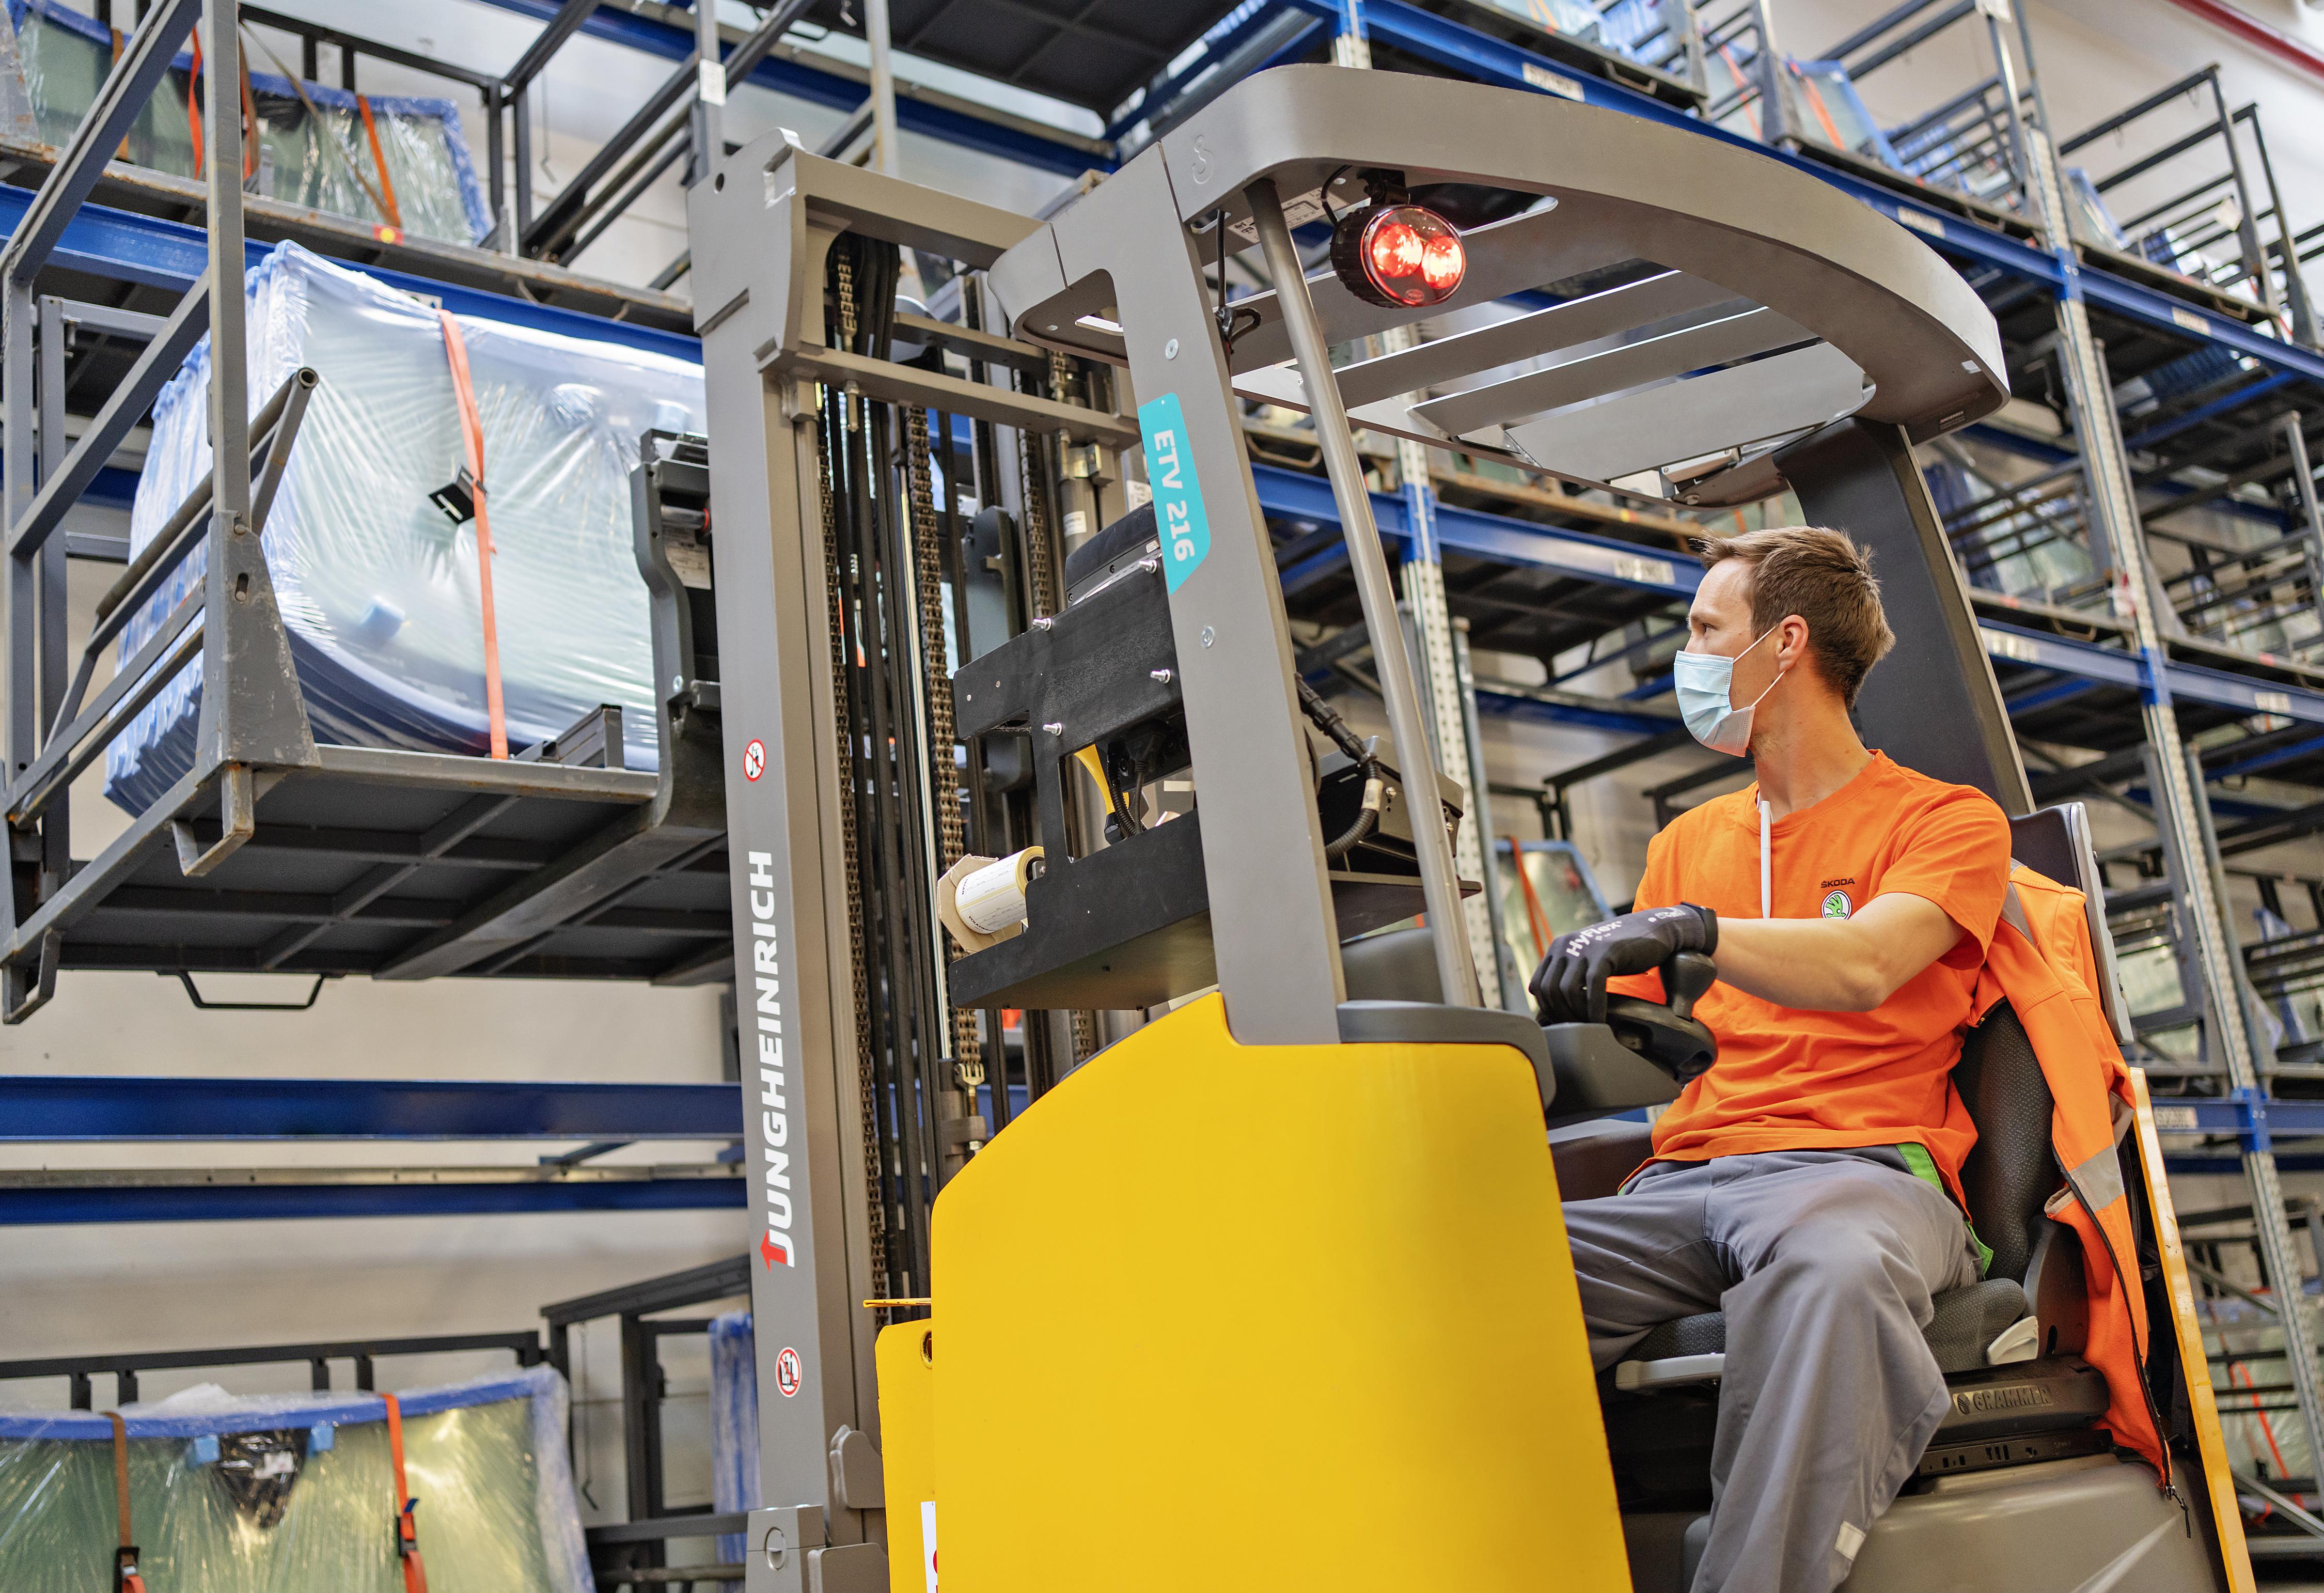 SKODA guarantees reliable supply of genuine parts worldwide despite coronavirus restrictions - Image 2